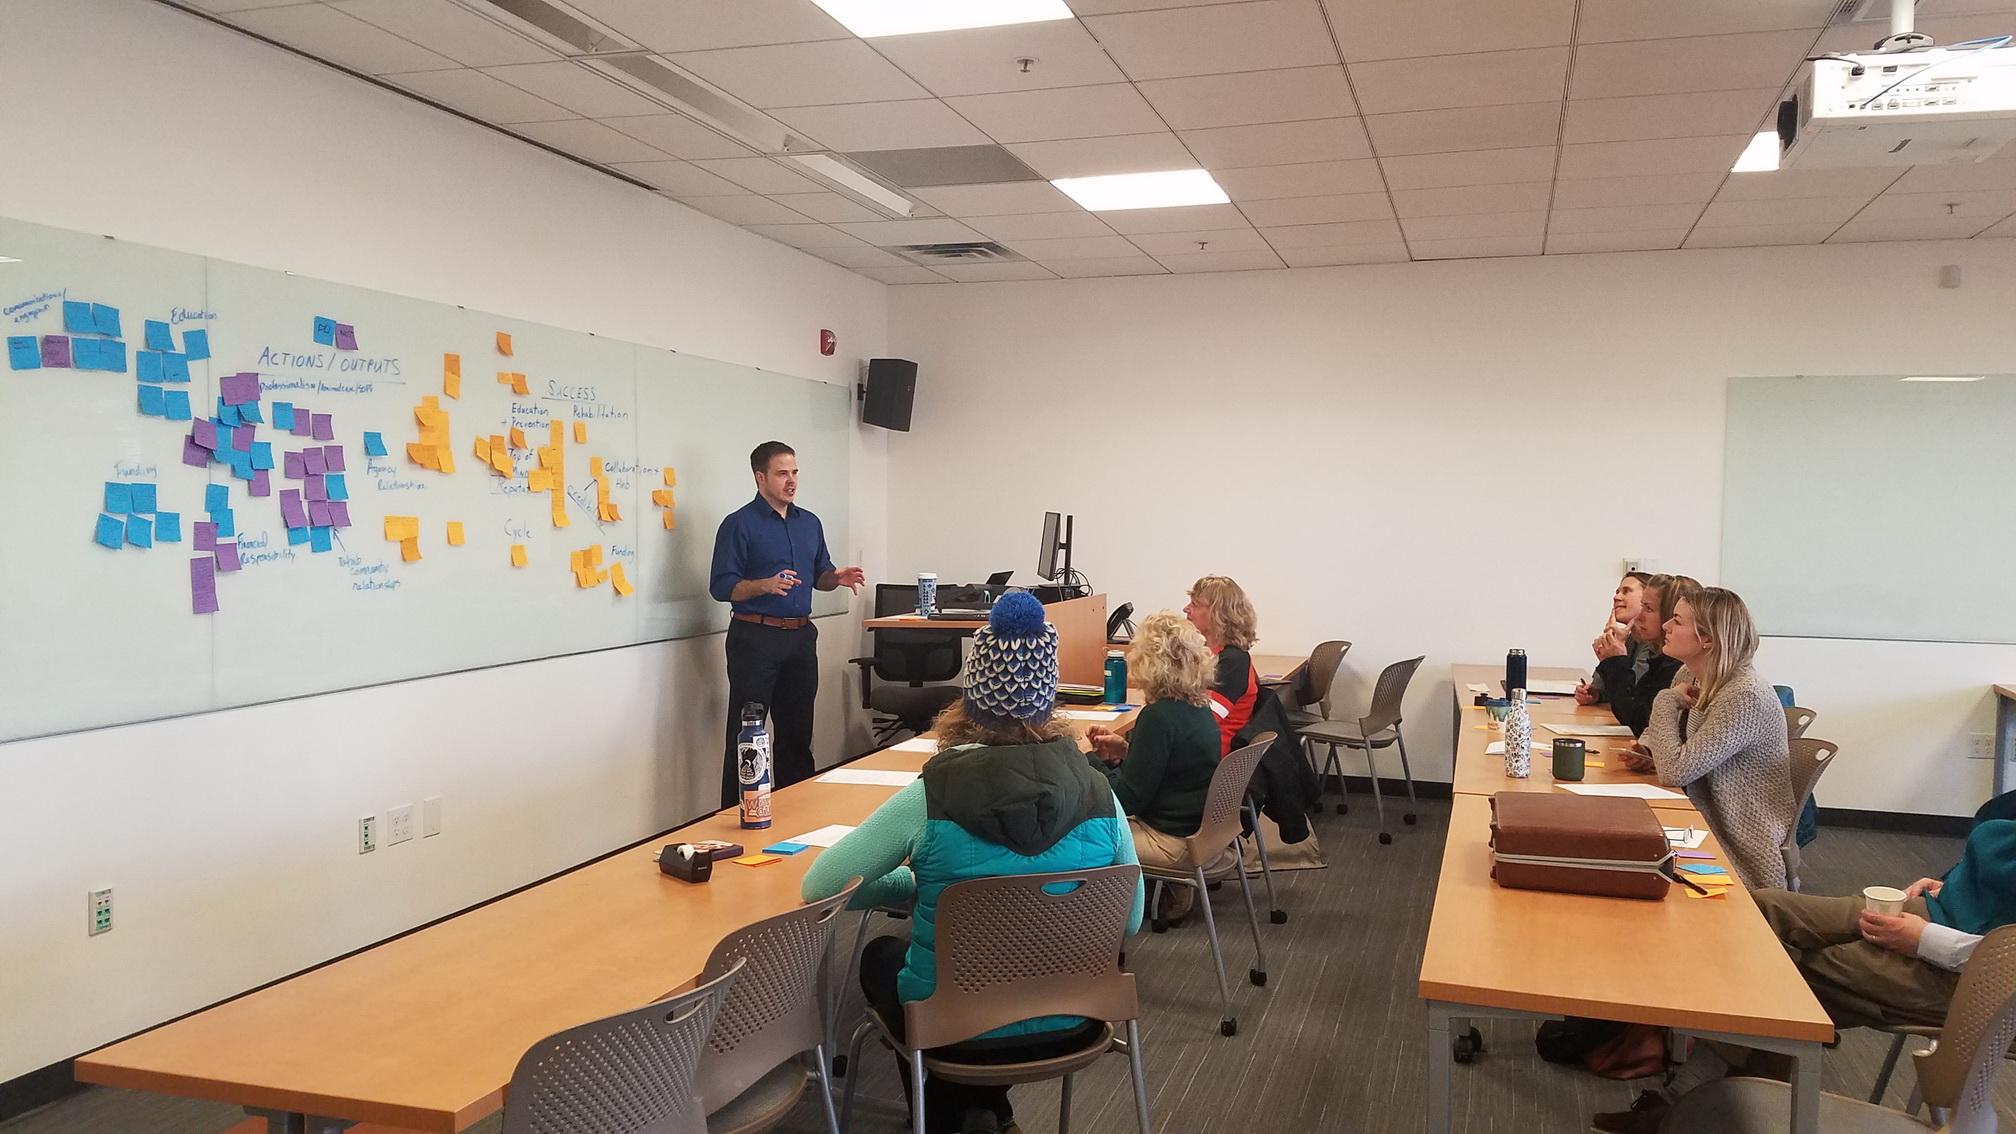 Adam Krynicki hosts a design sprint to help a new venture define its service offering